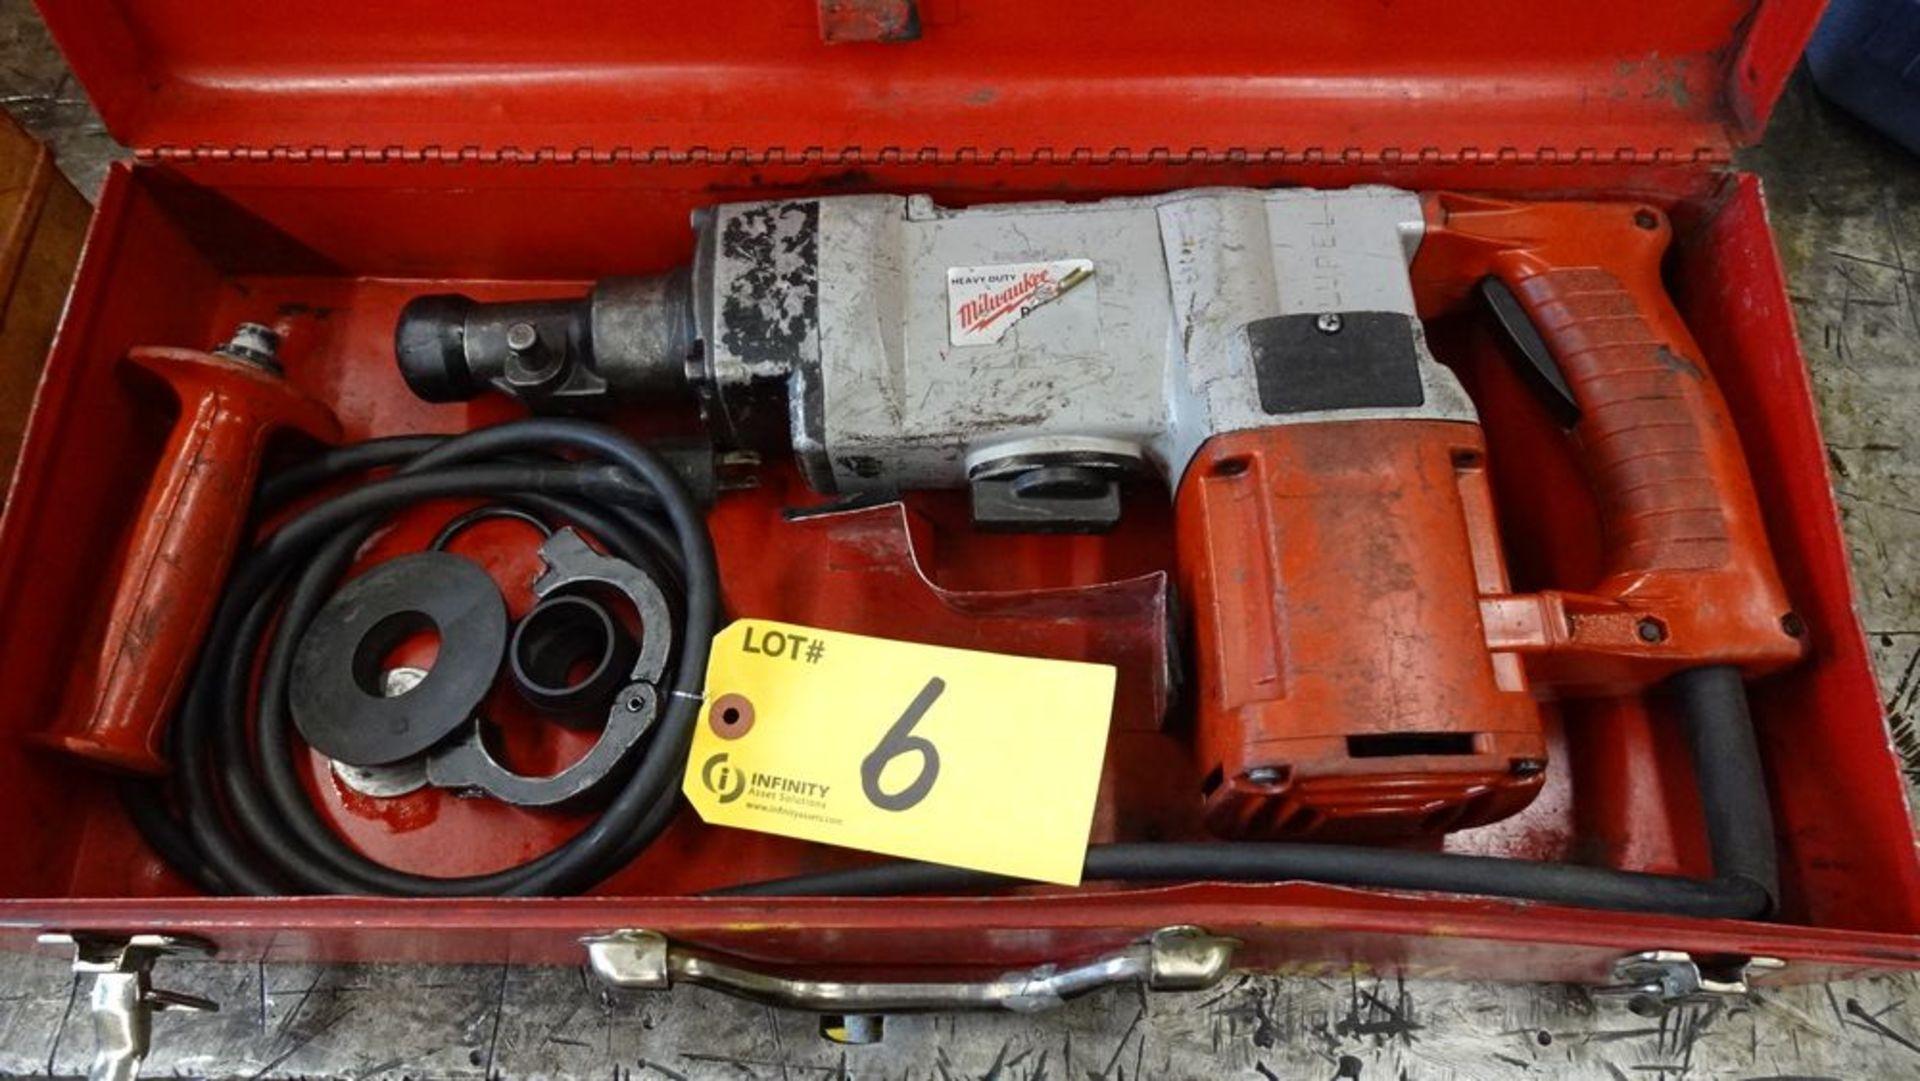 "Lot 6 - MILWAUKEE 1-1/2"" ROTARY HAMMER, 120V, 500 RPM, 4100 BPM, C/W CASE, S/N 688B198150017"